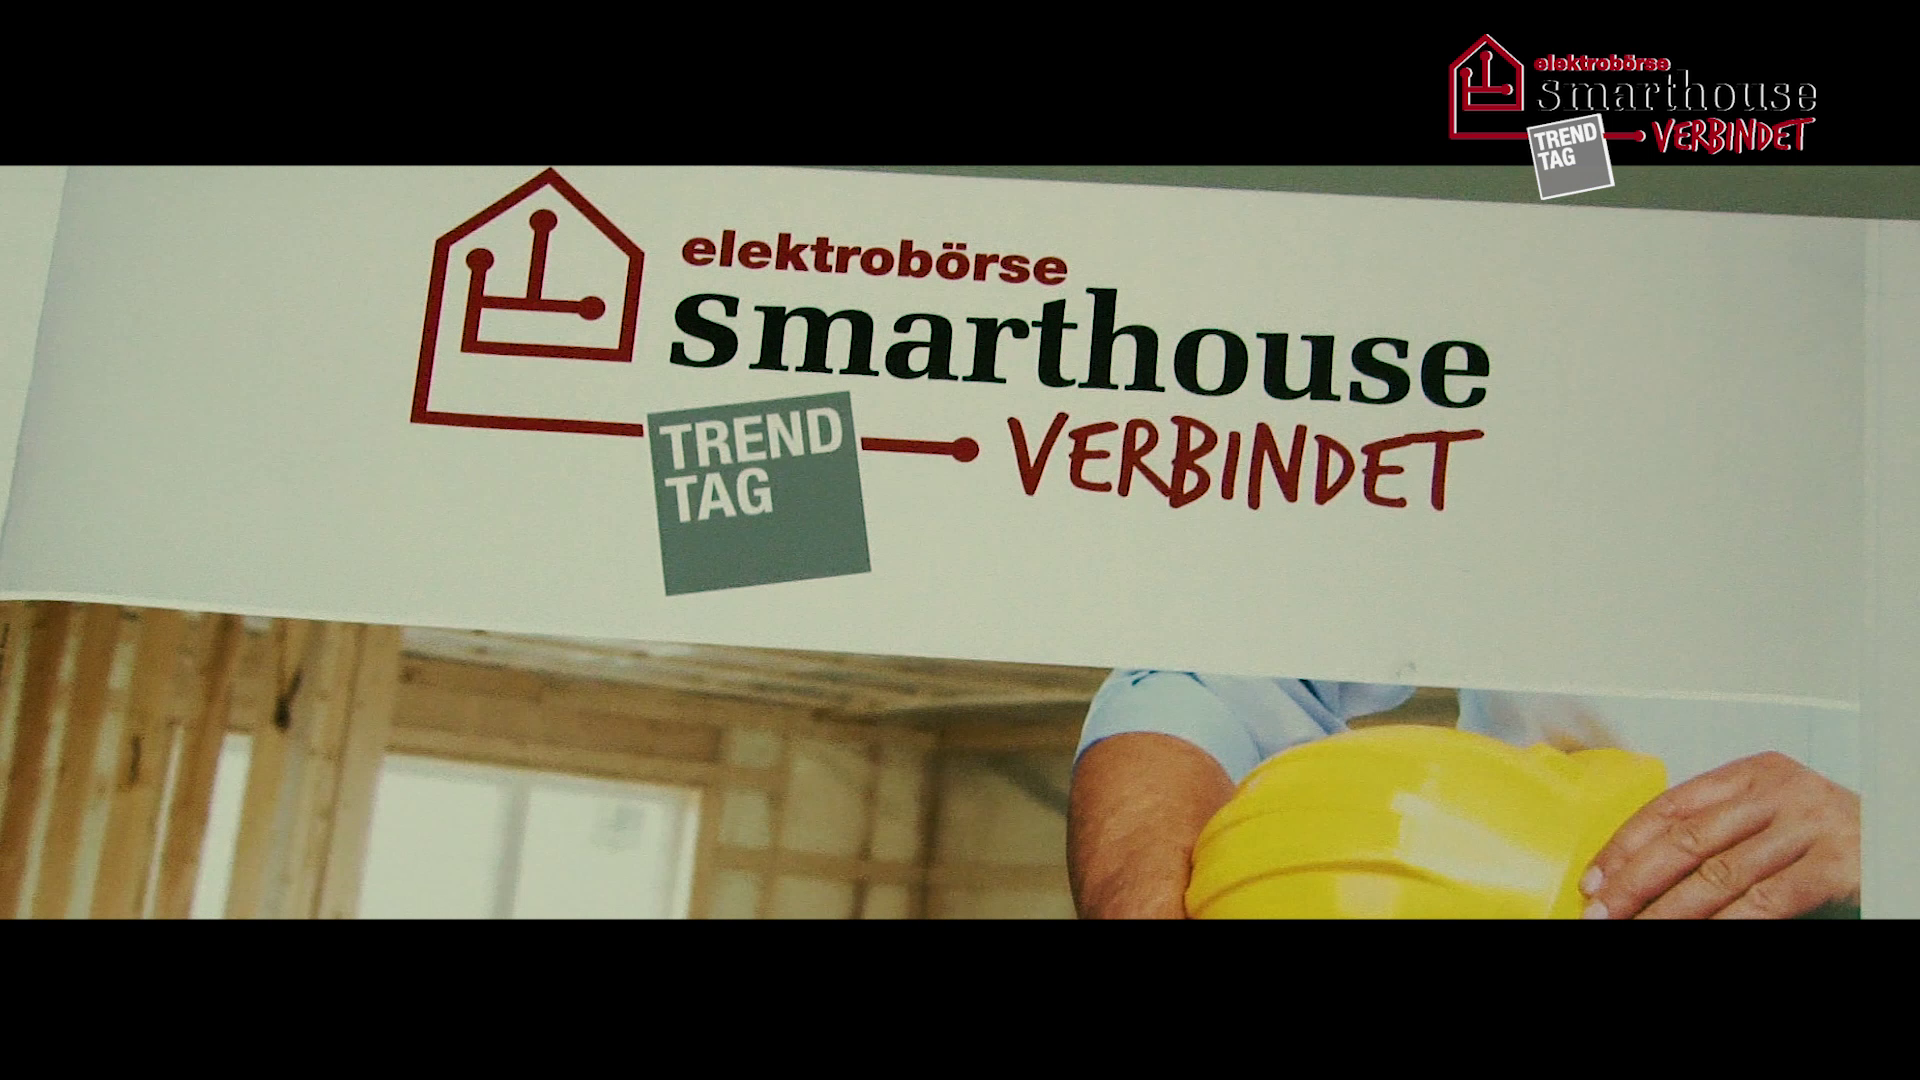 elektrobörse smarthouse Trendtag 2018